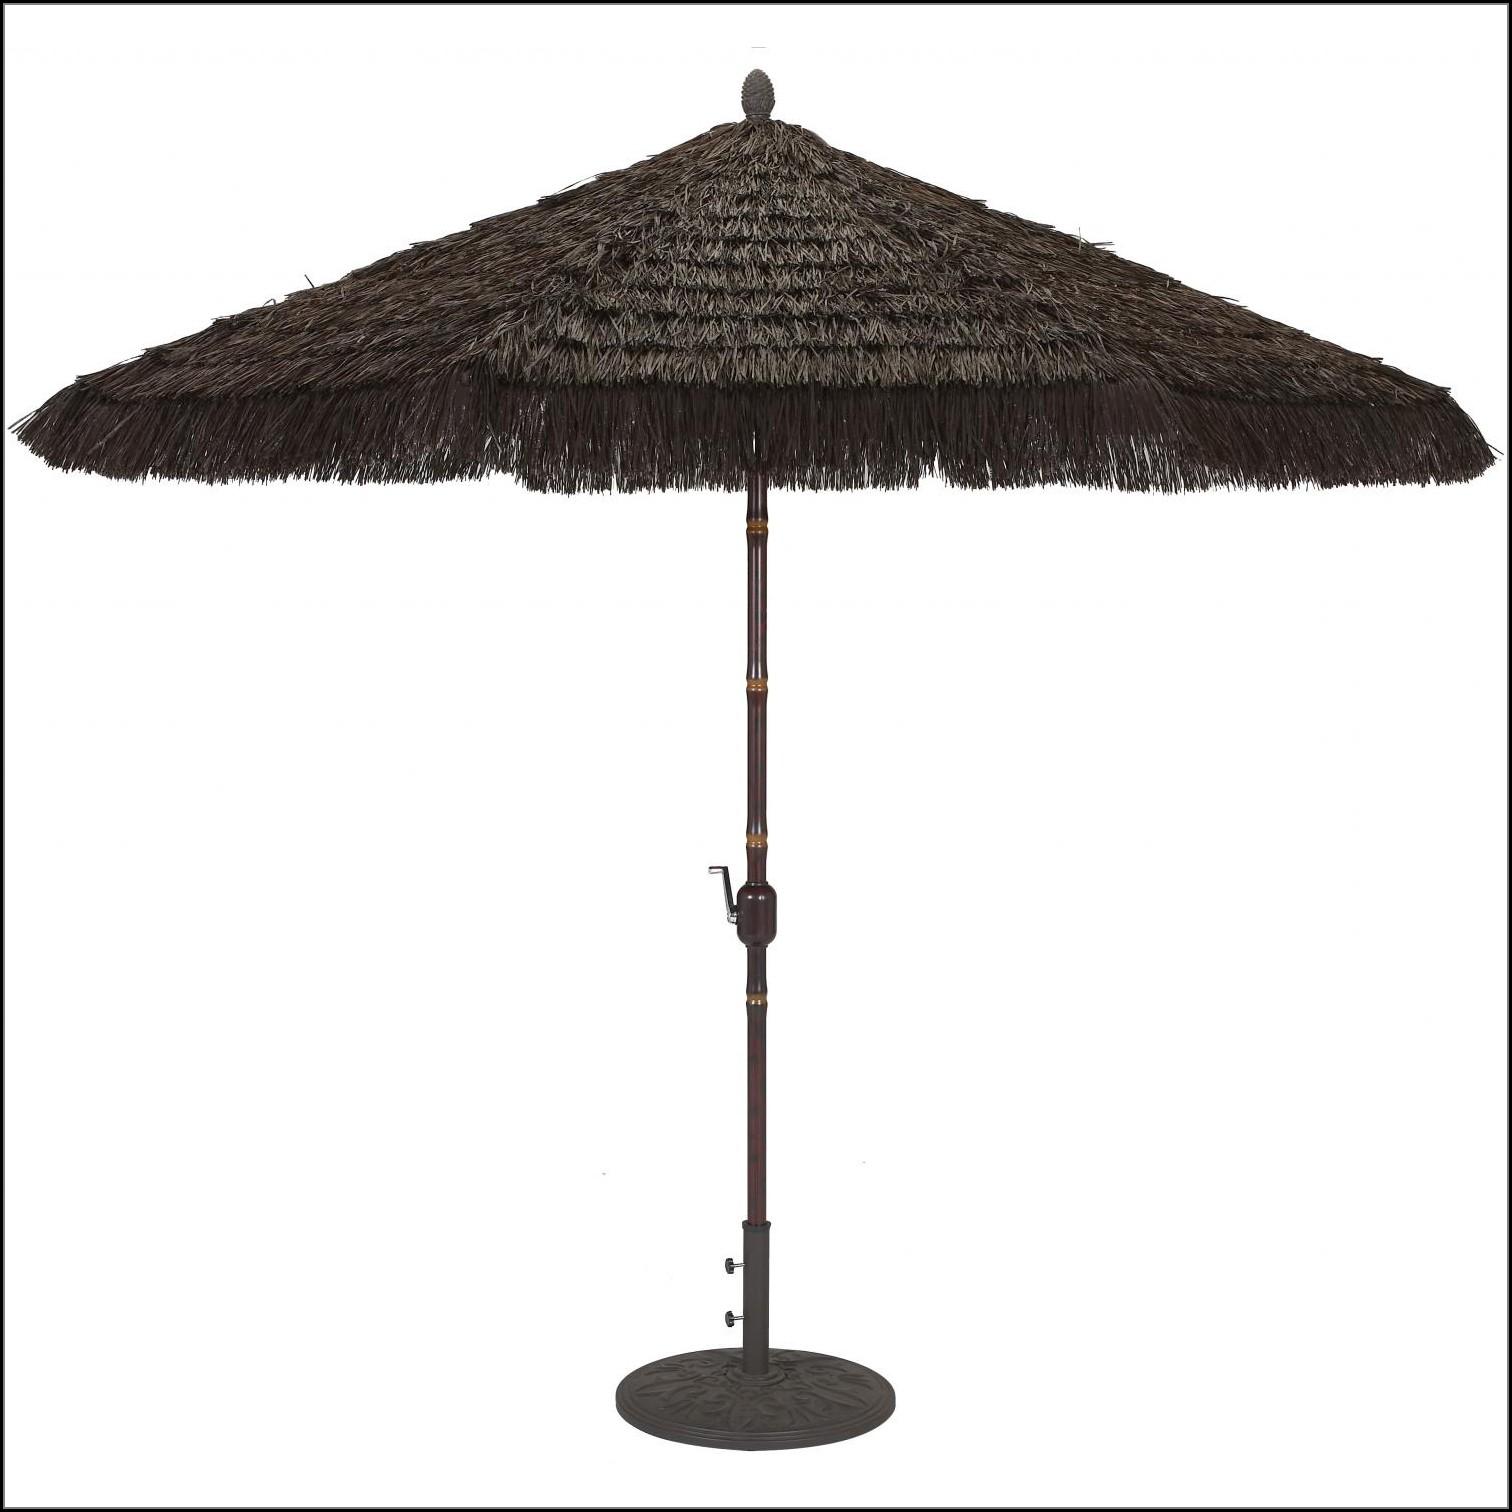 9 Ft Patio Umbrella With Crank